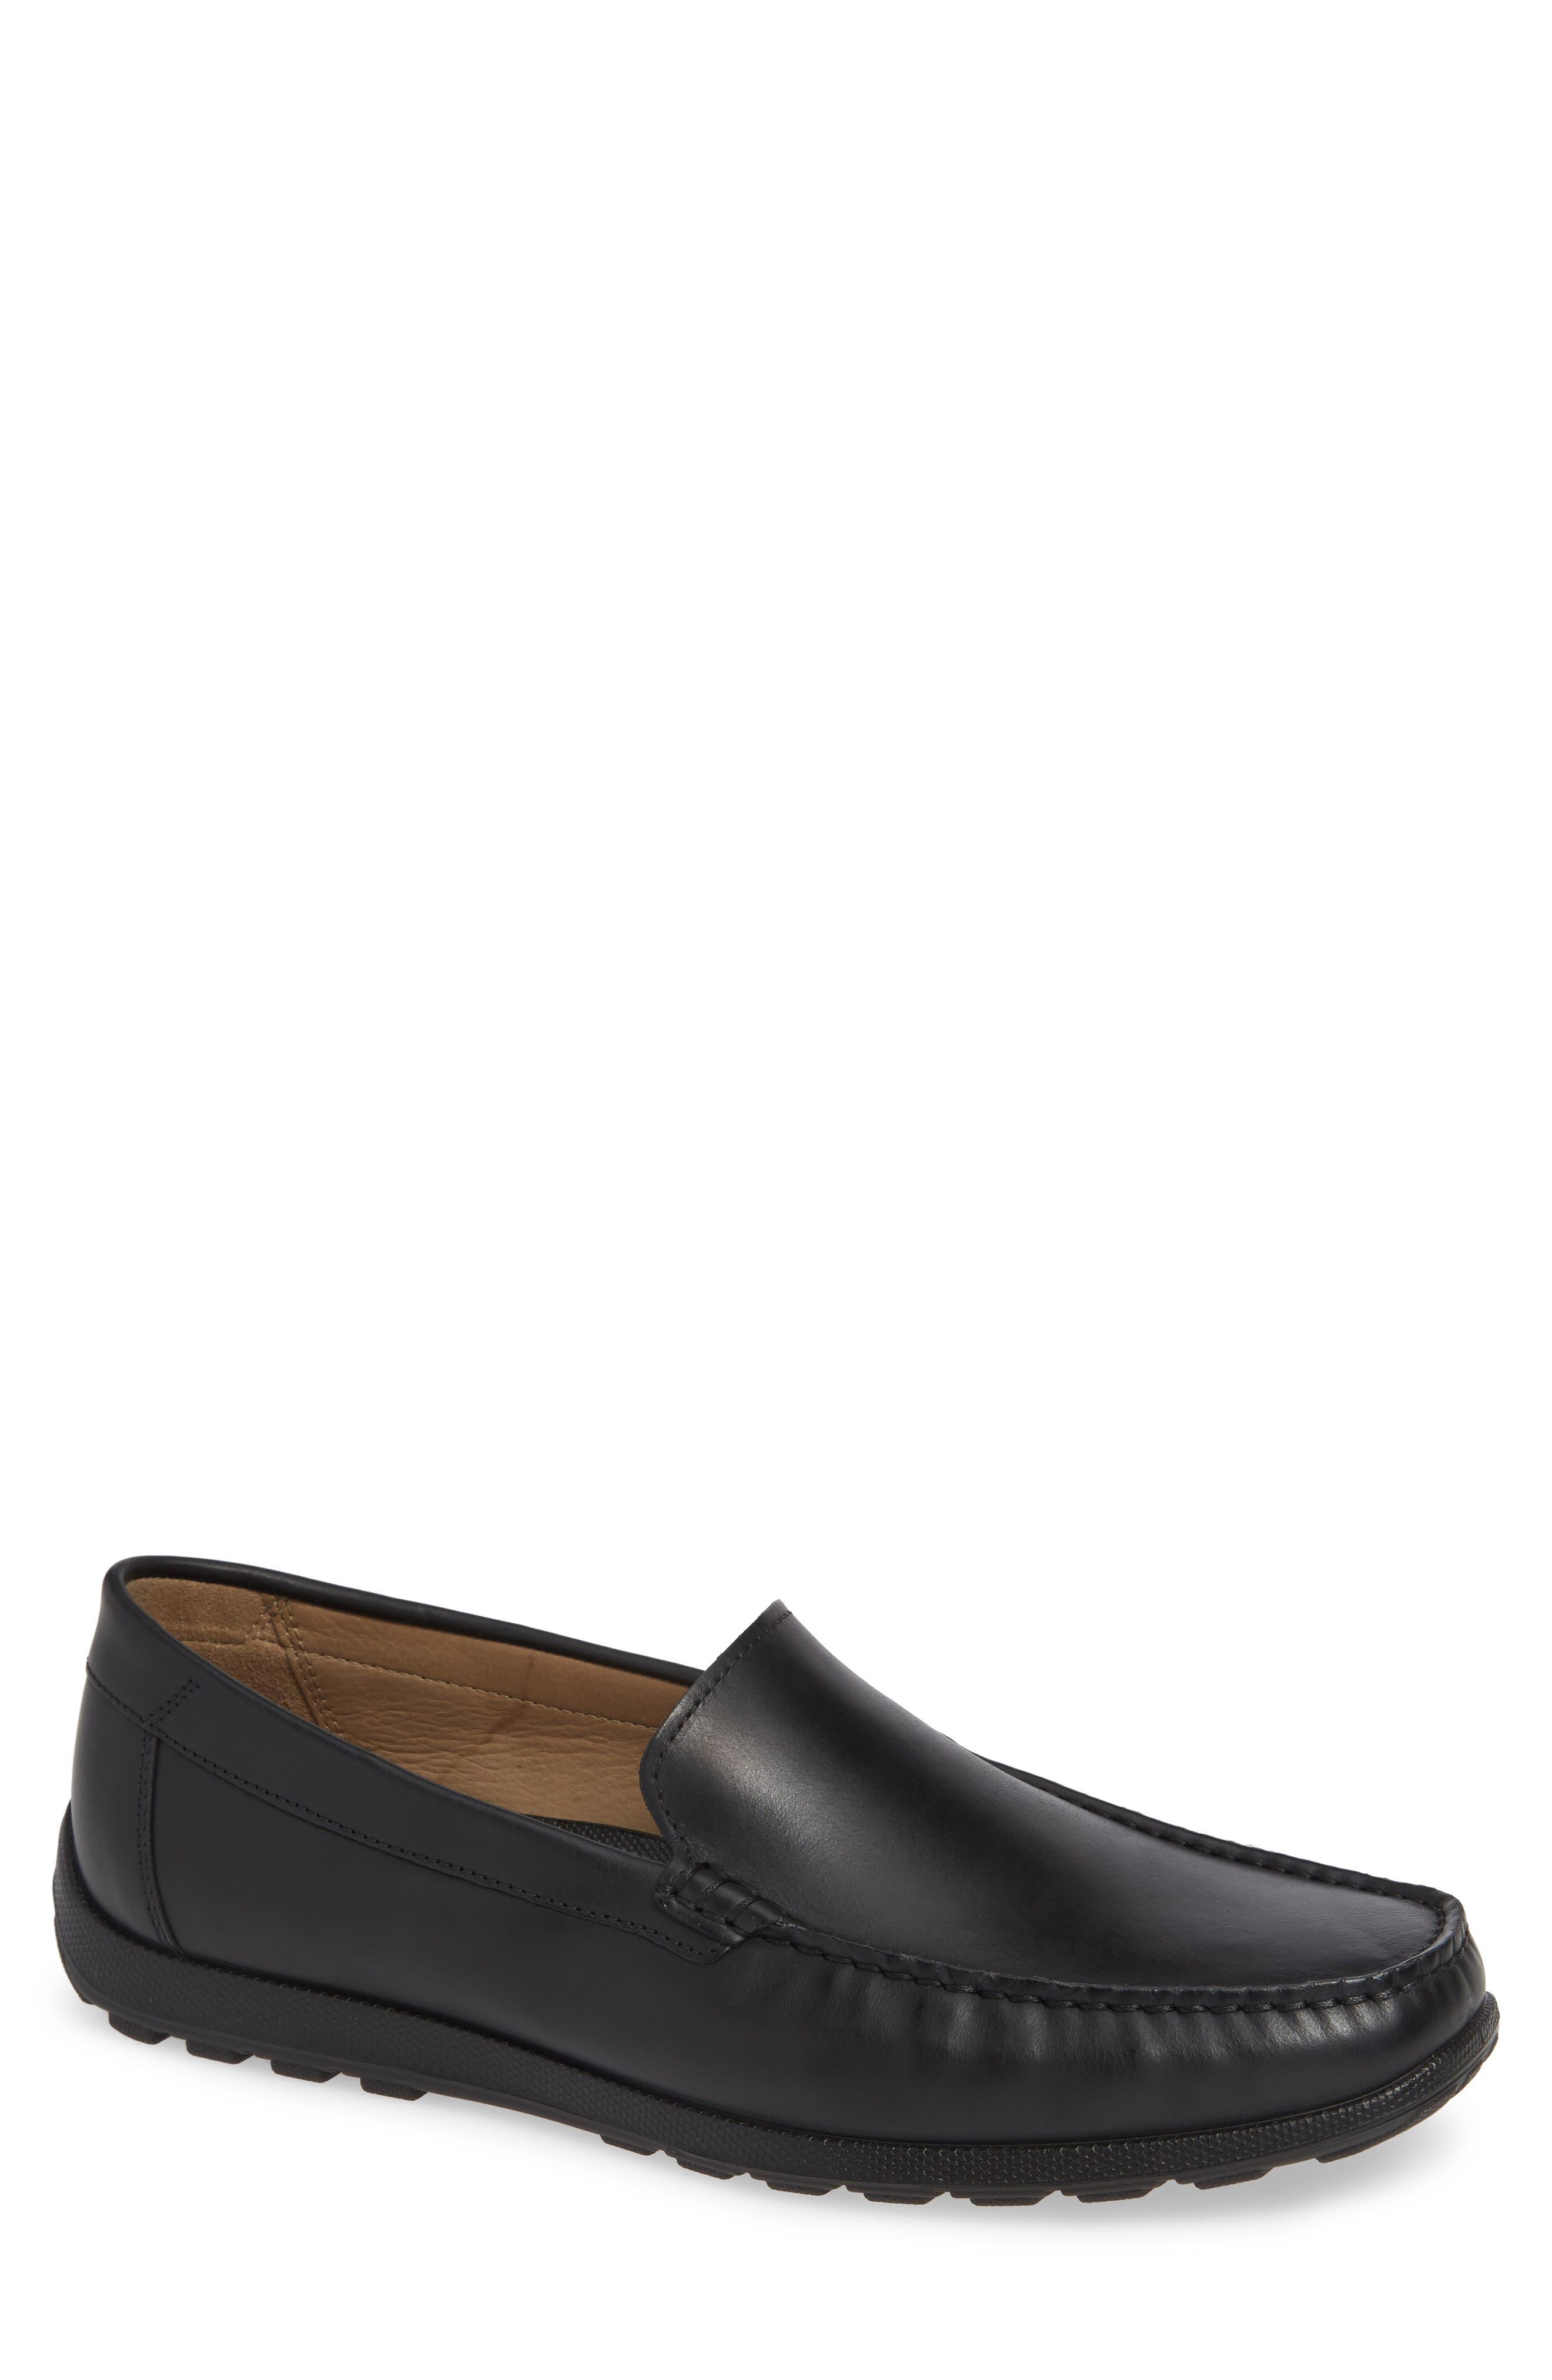 Dip Moc Toe Driving Loafer,                         Main,                         color, BLACK LEATHER